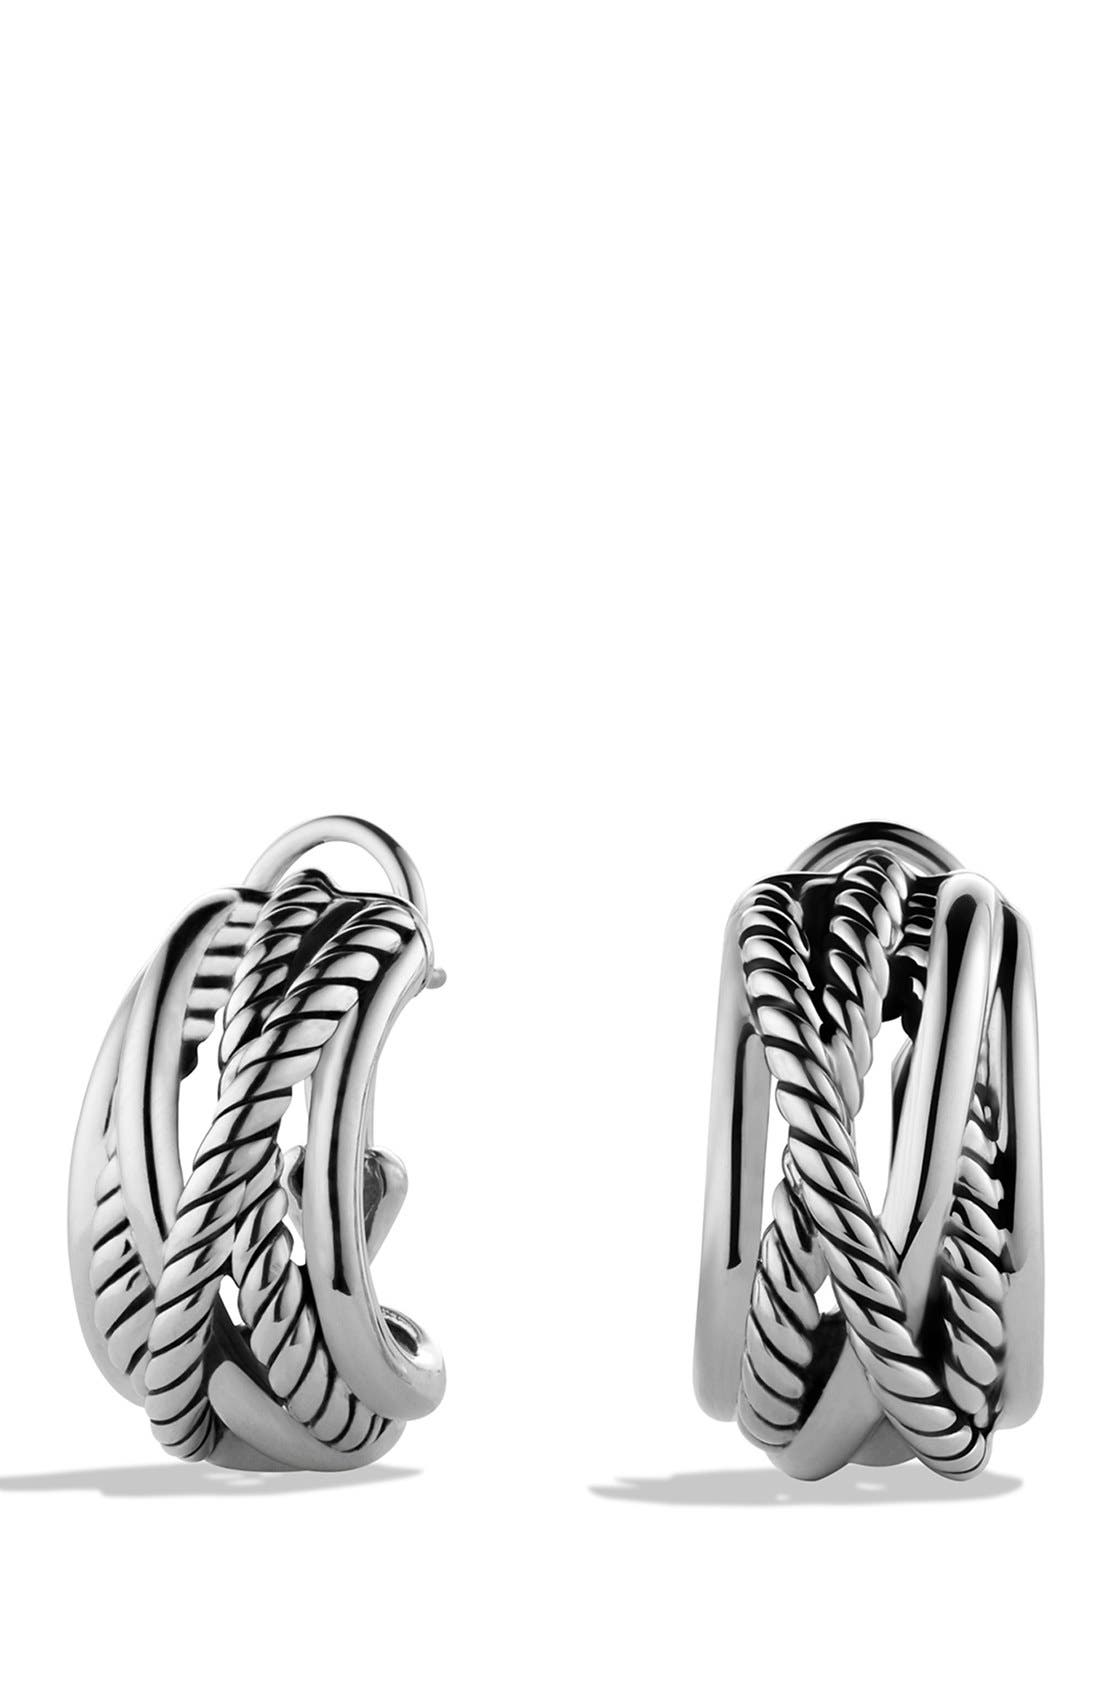 Alternate Image 1 Selected - David Yurman 'Crossover' Earrings